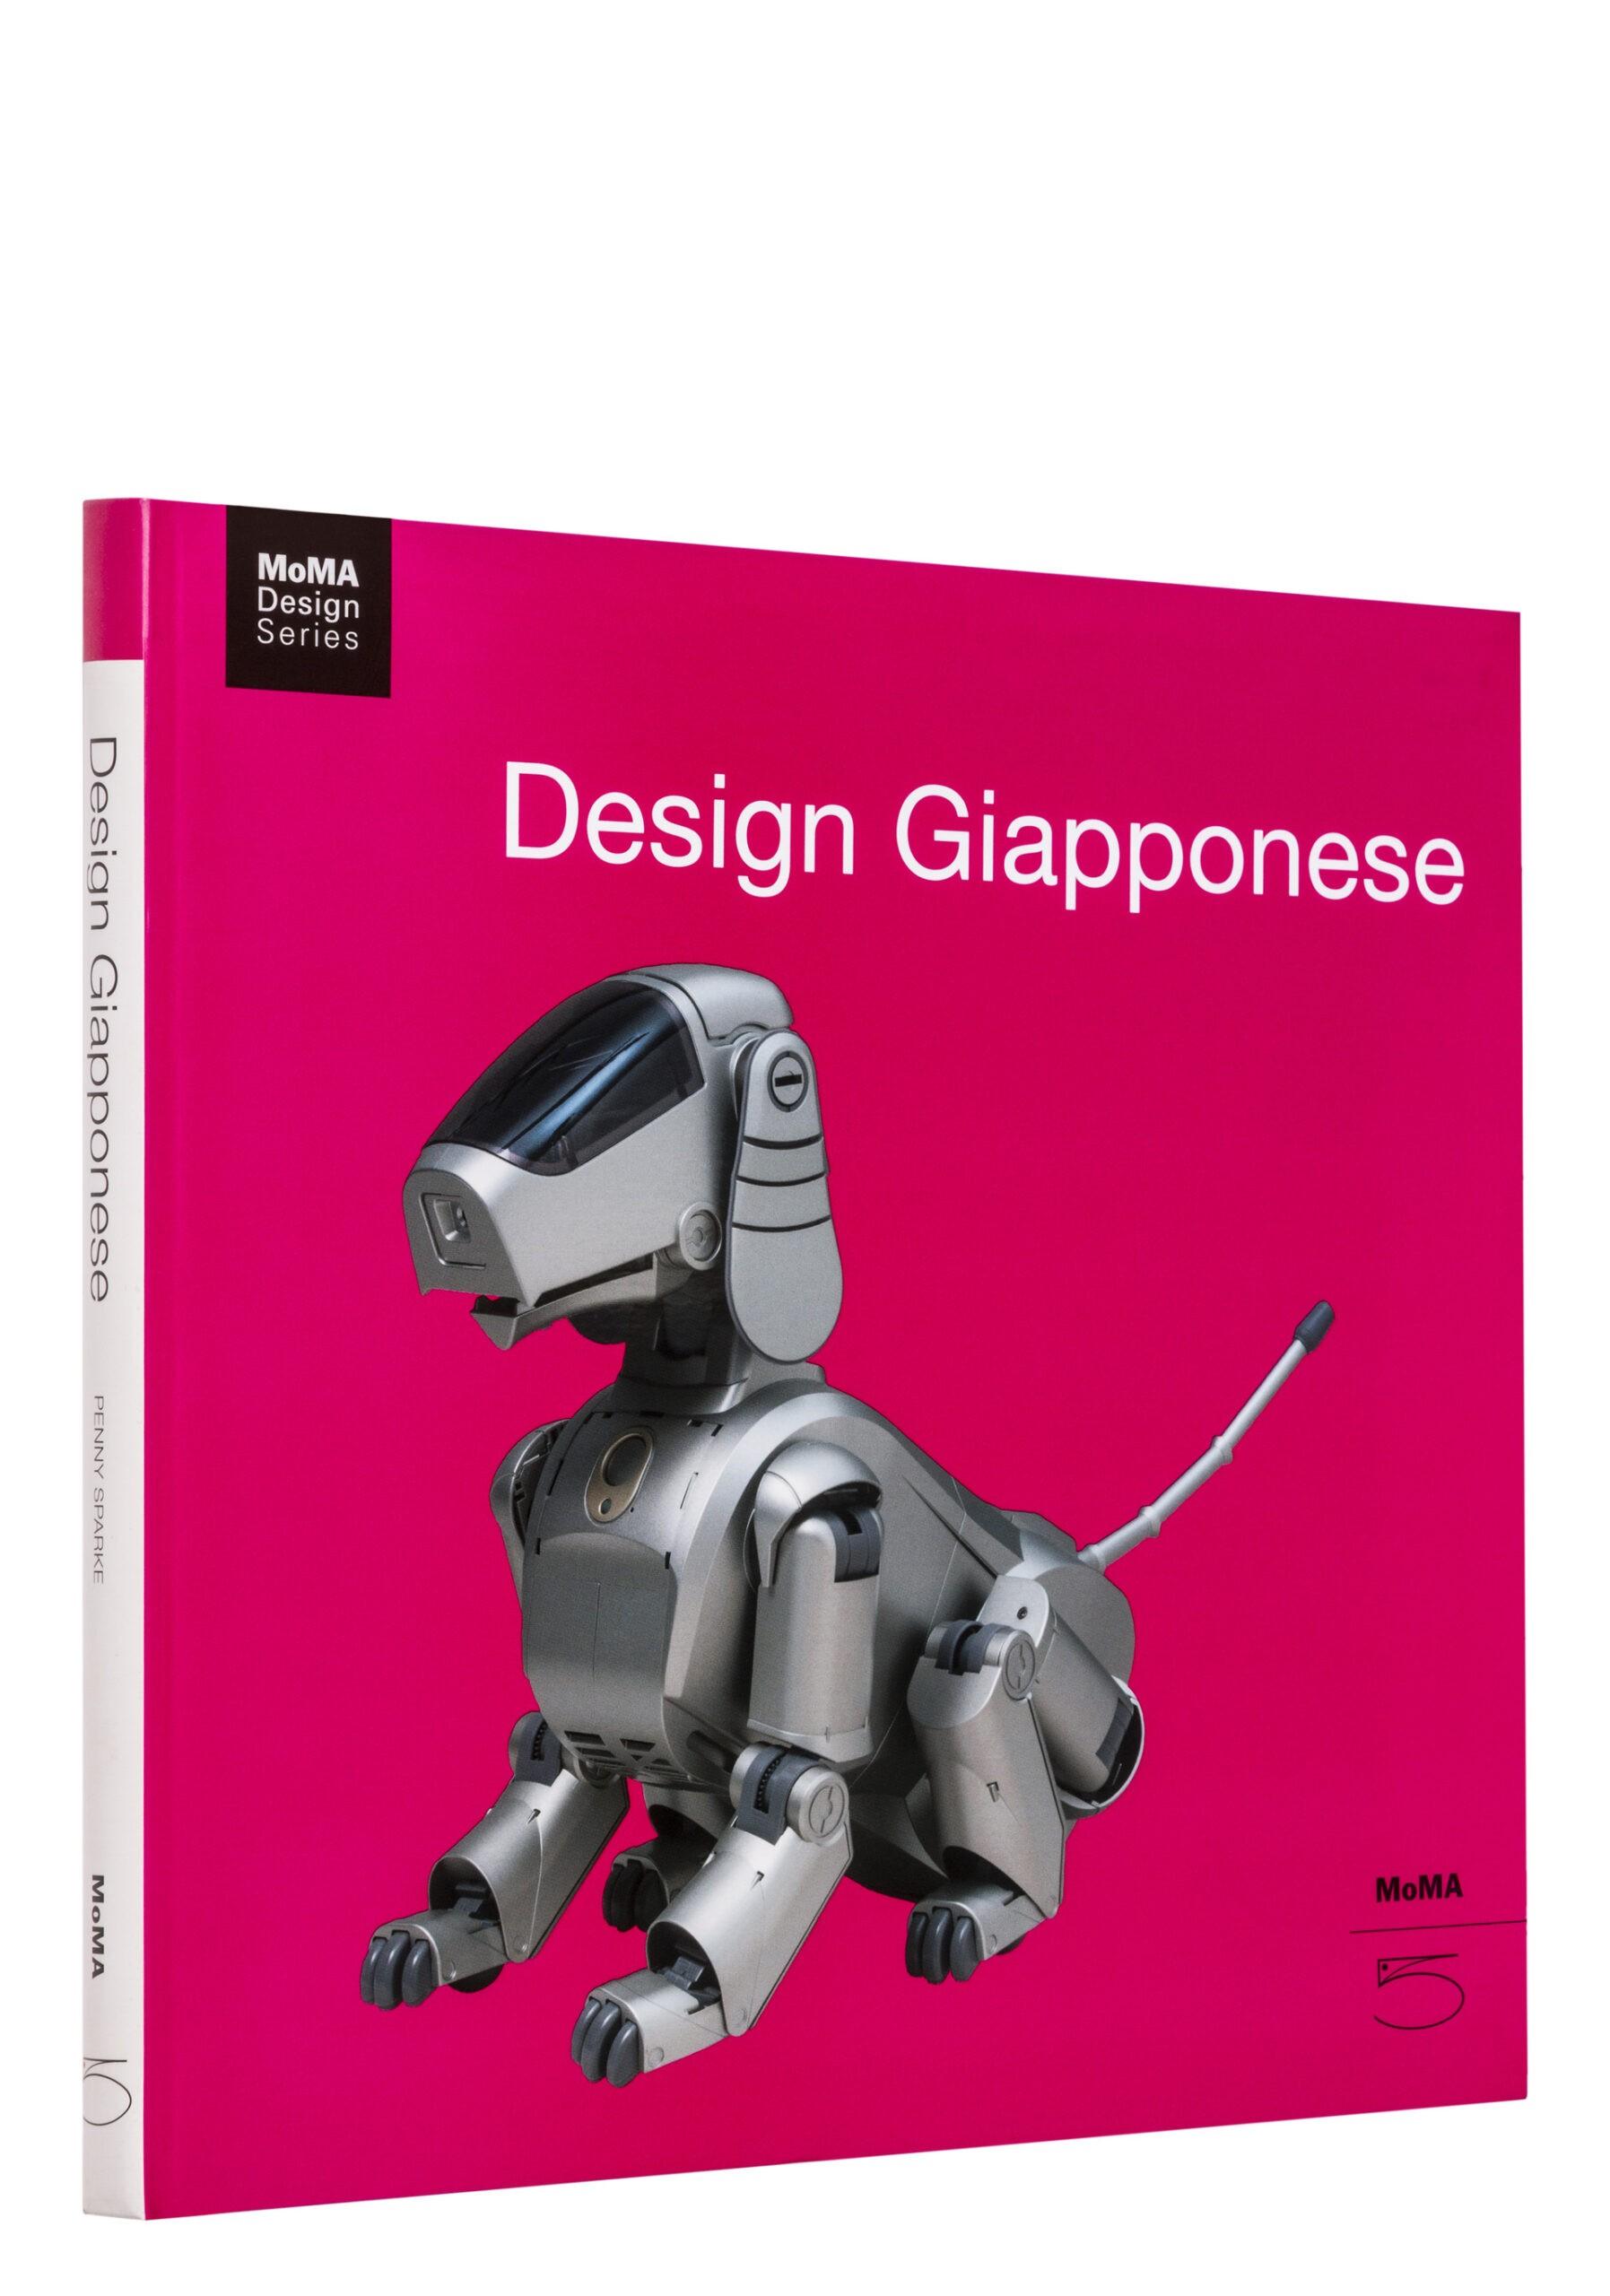 Design Giapponese